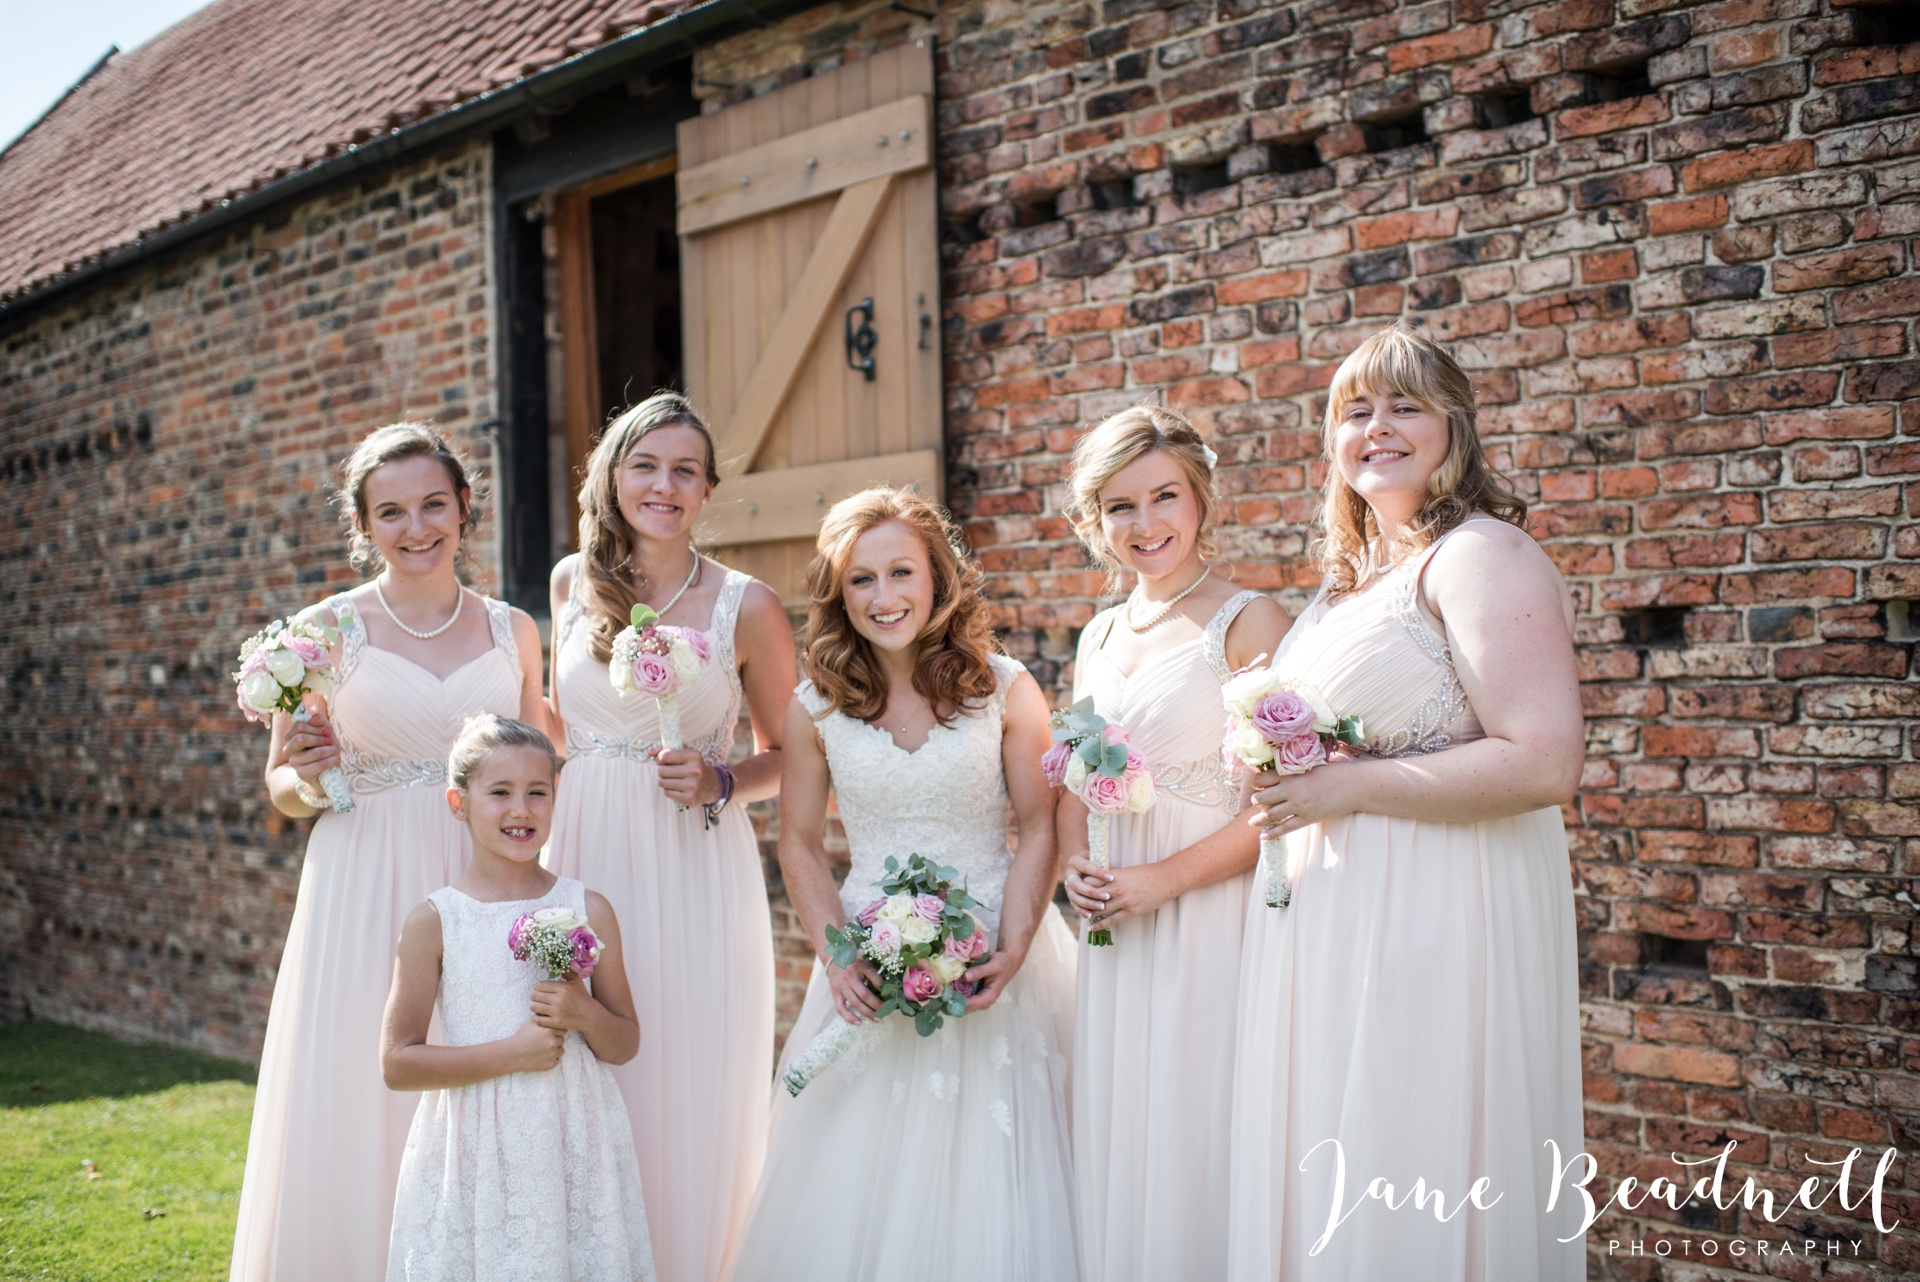 yorkshire-fine-art-wedding-photographer-jane-beadnell-photography-poppleton-york_0094